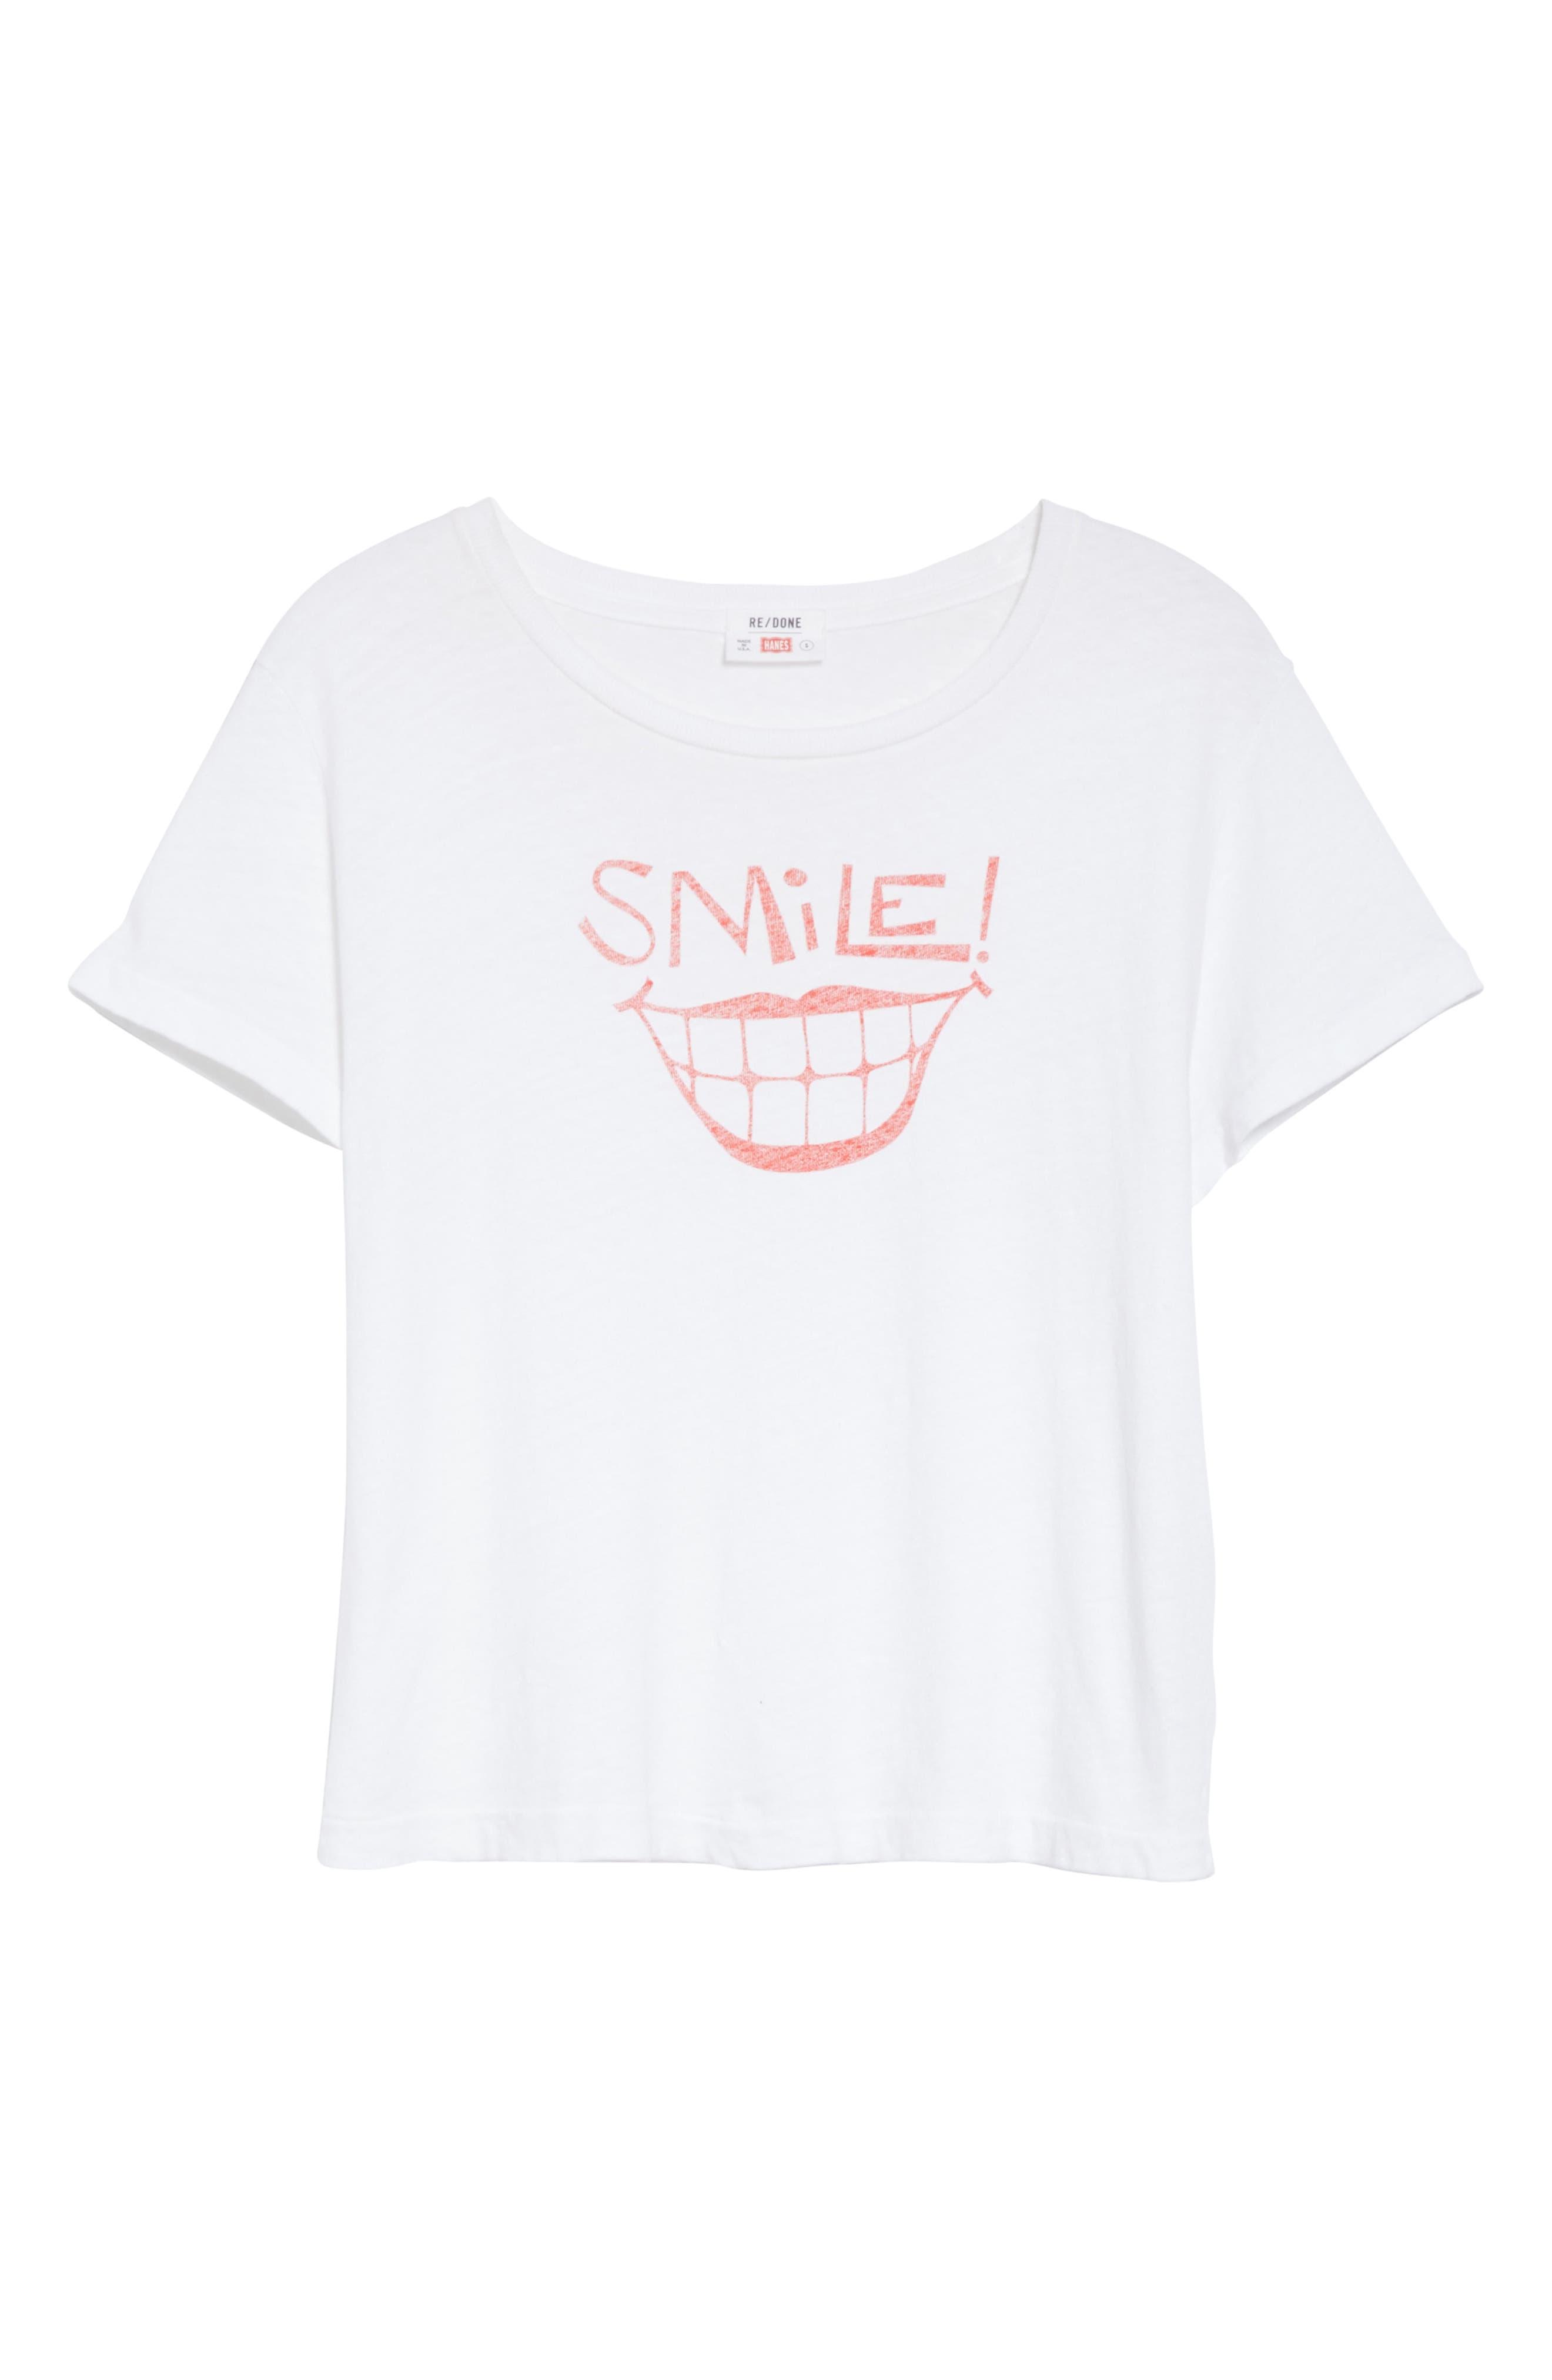 Smile Graphic Tee,                             Alternate thumbnail 6, color,                             OPTIC WHITE